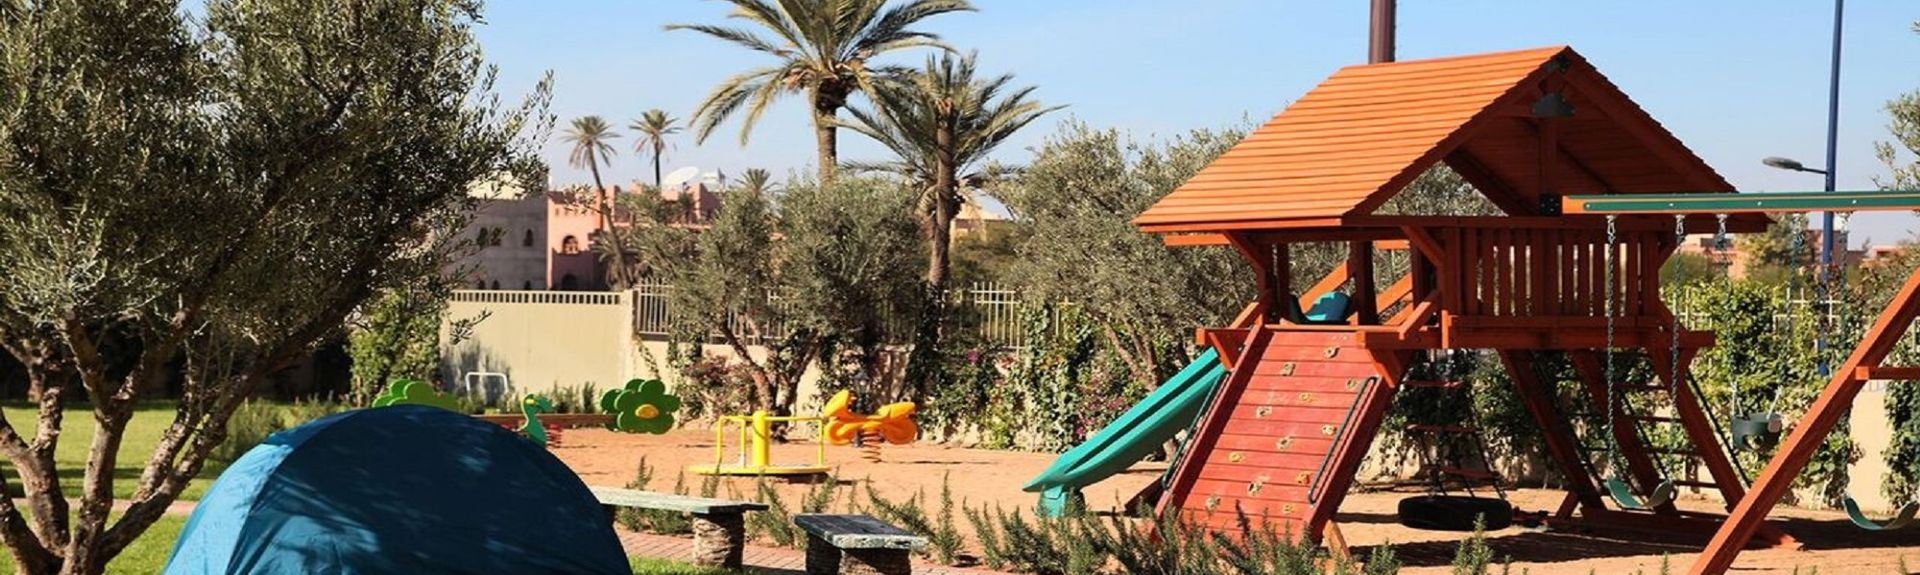 Bab Doukkala, Marrakech, Province de Marrakech, Maroc